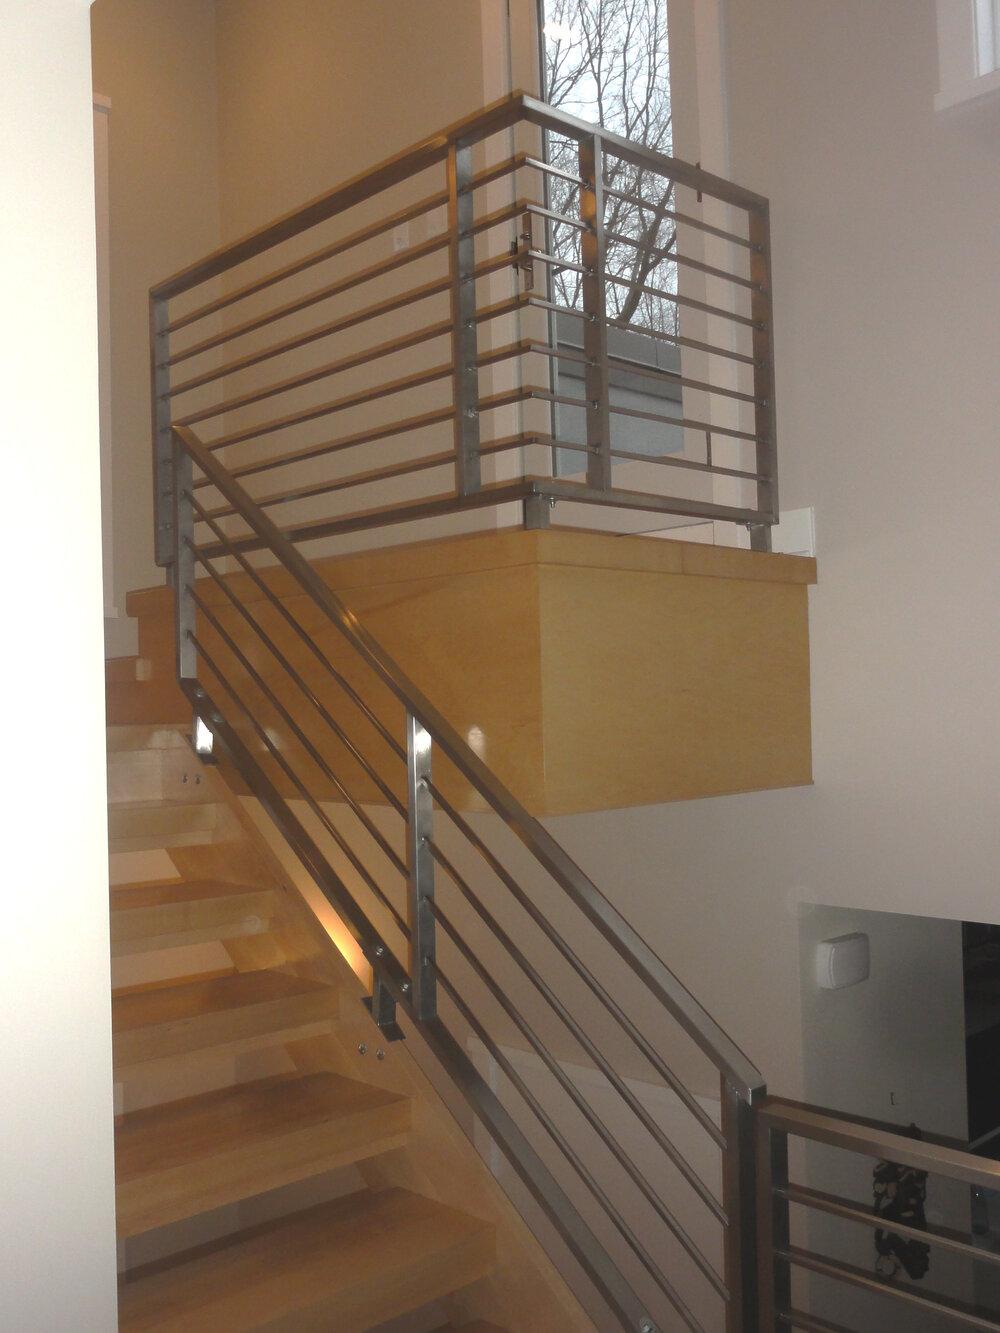 Horizontal railing and custom staircase